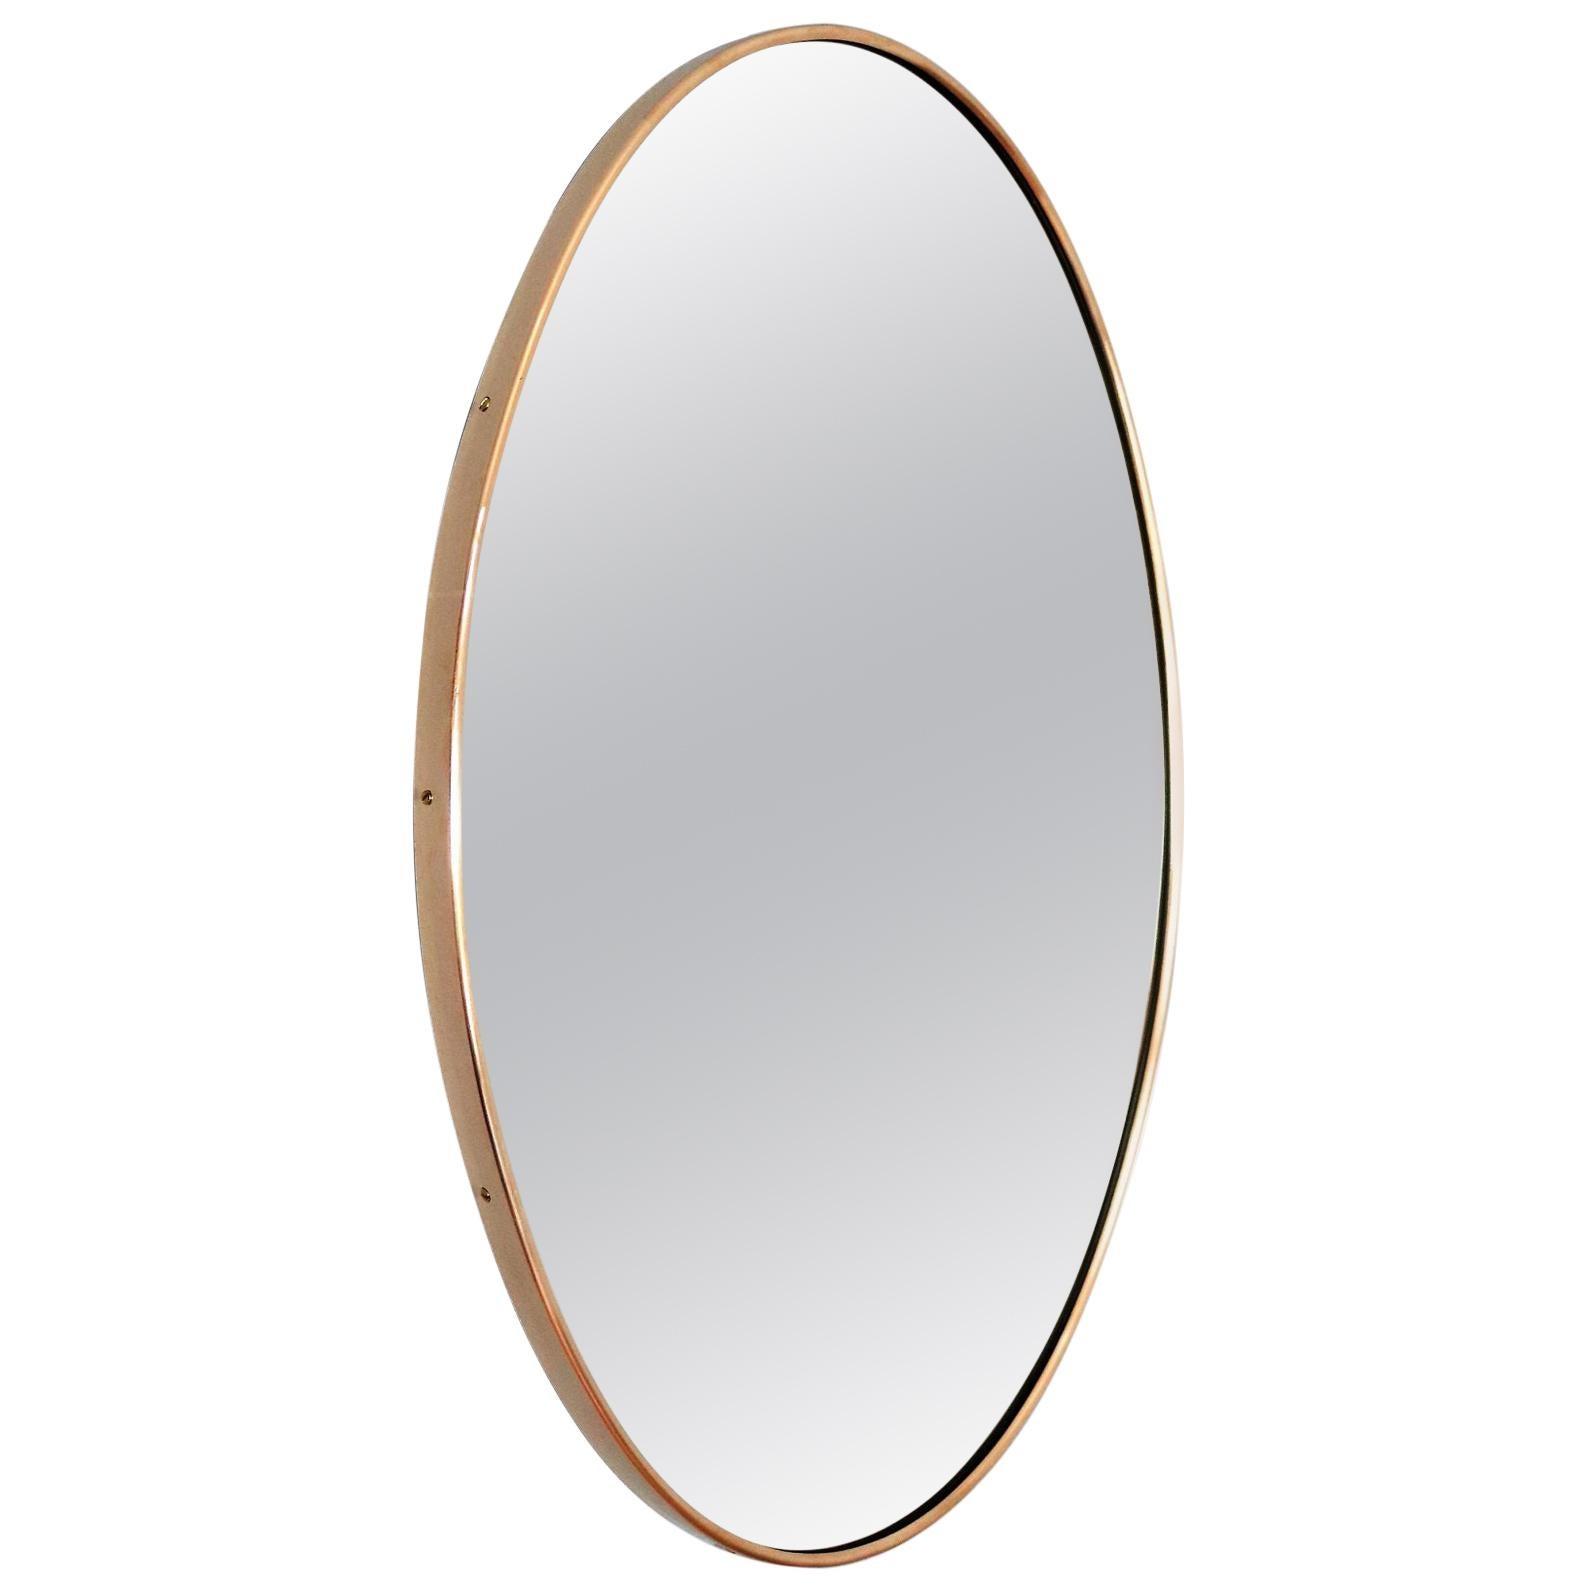 Italian Regency Wall Mirror with Brass Frame, 1970s